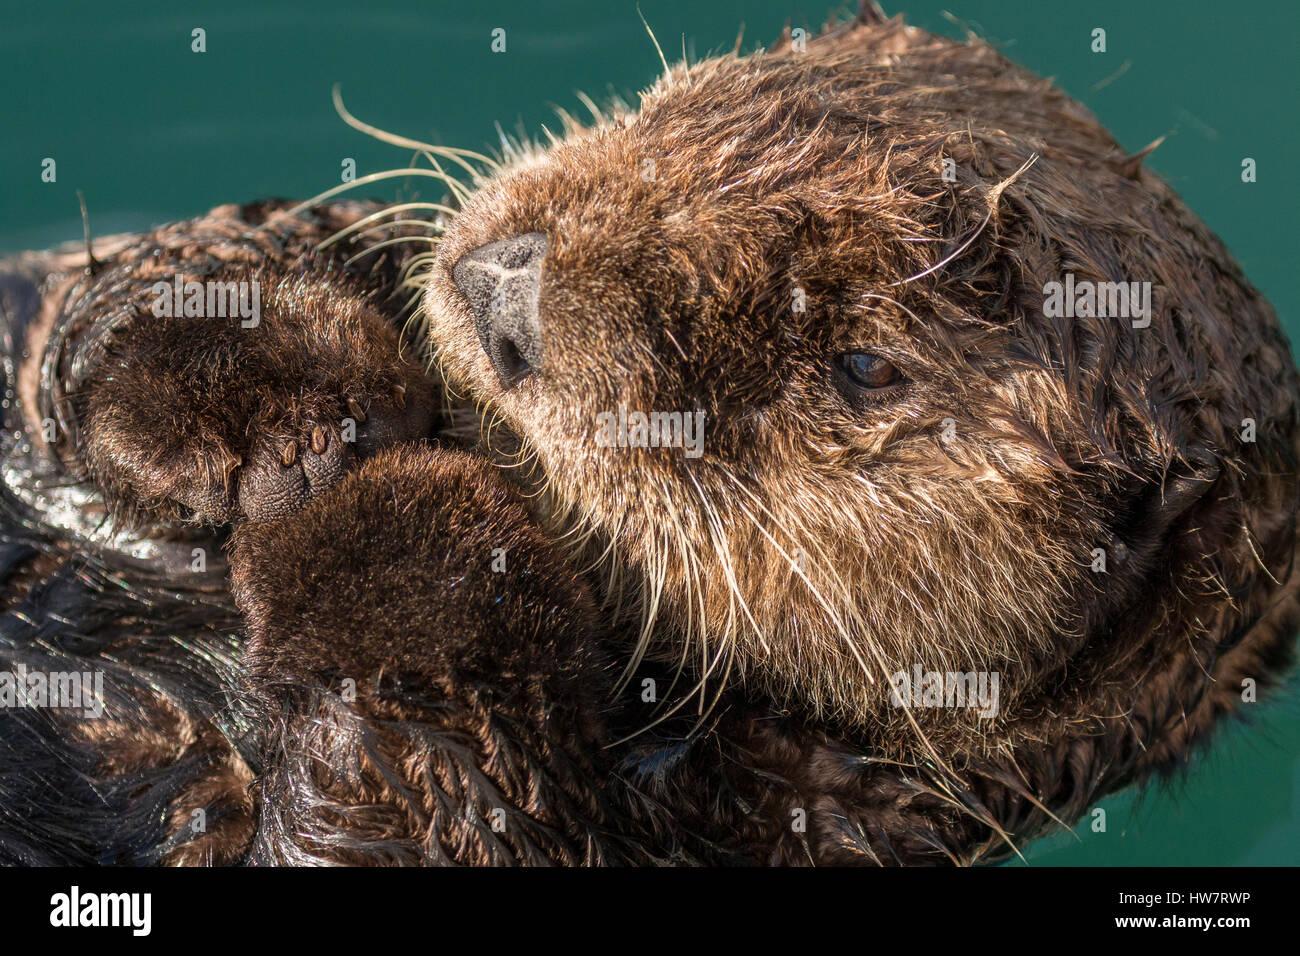 Sea otter floating in Seward harbor, Alaska. - Stock Image